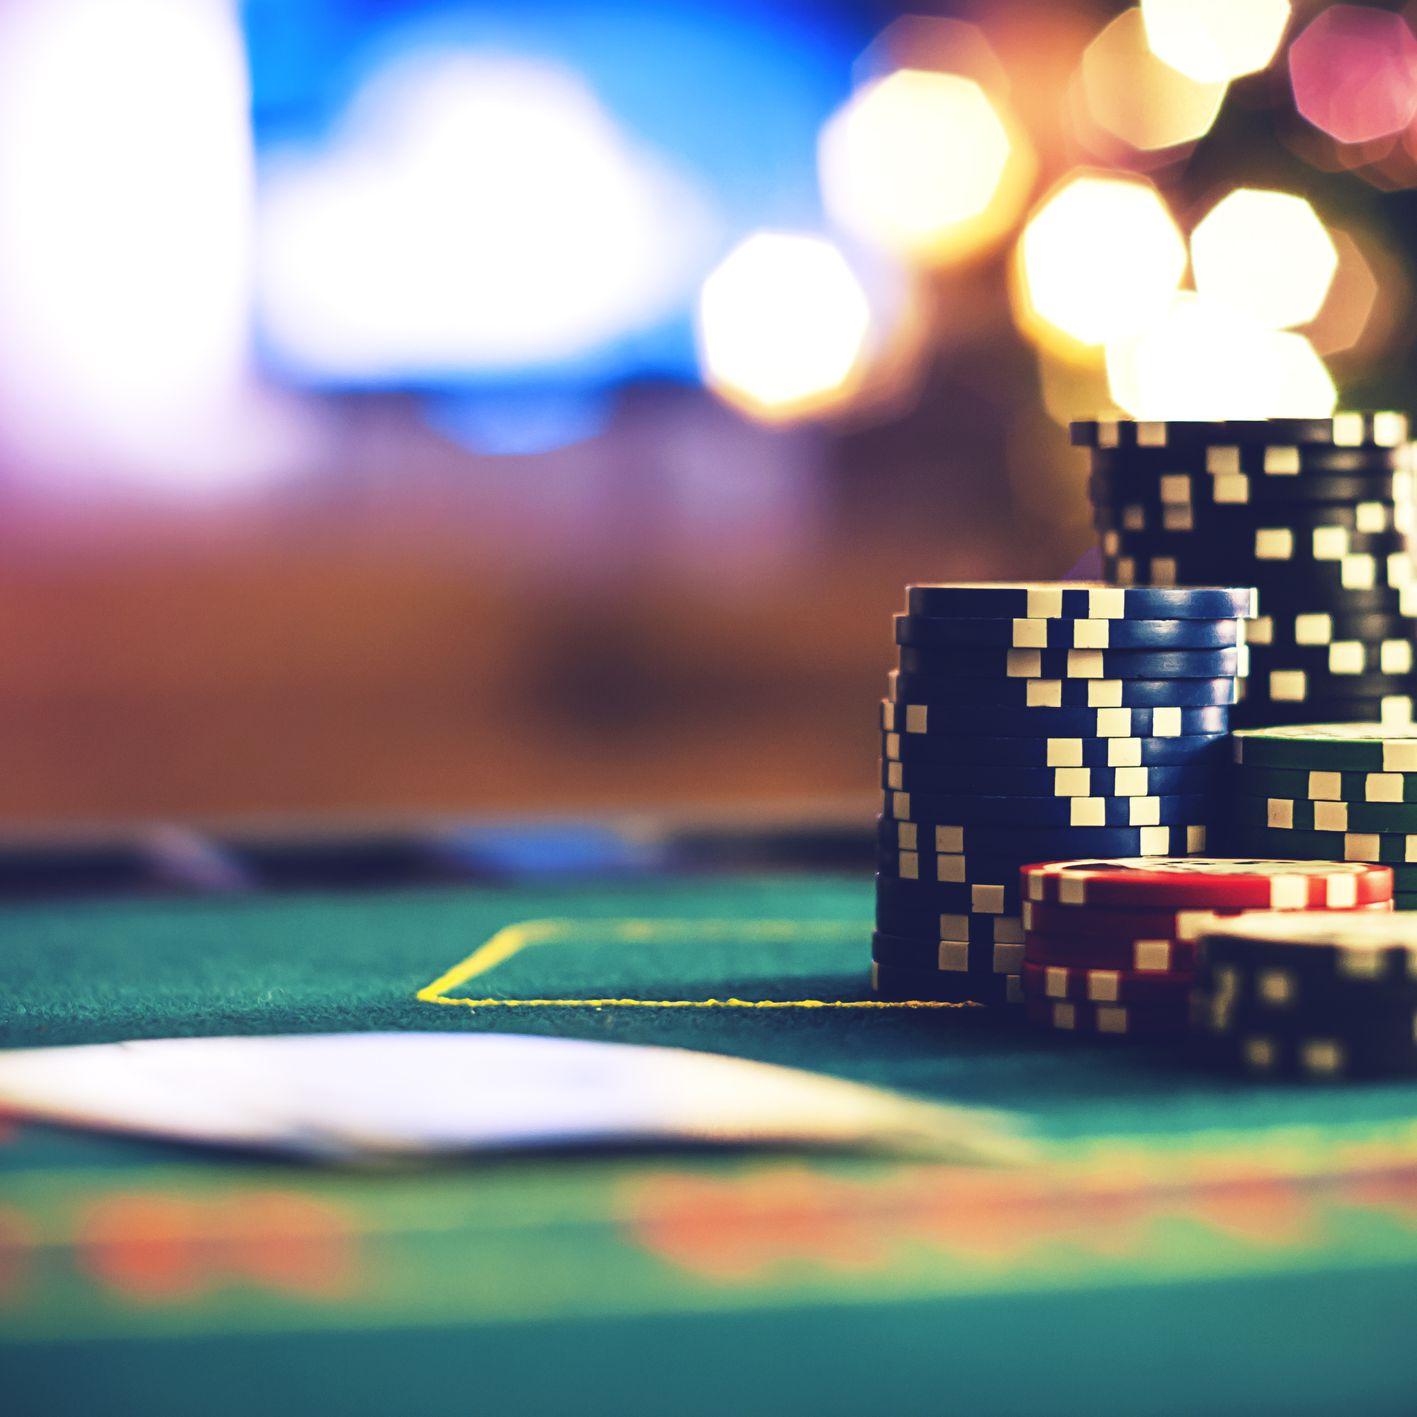 Free casino games by casino world